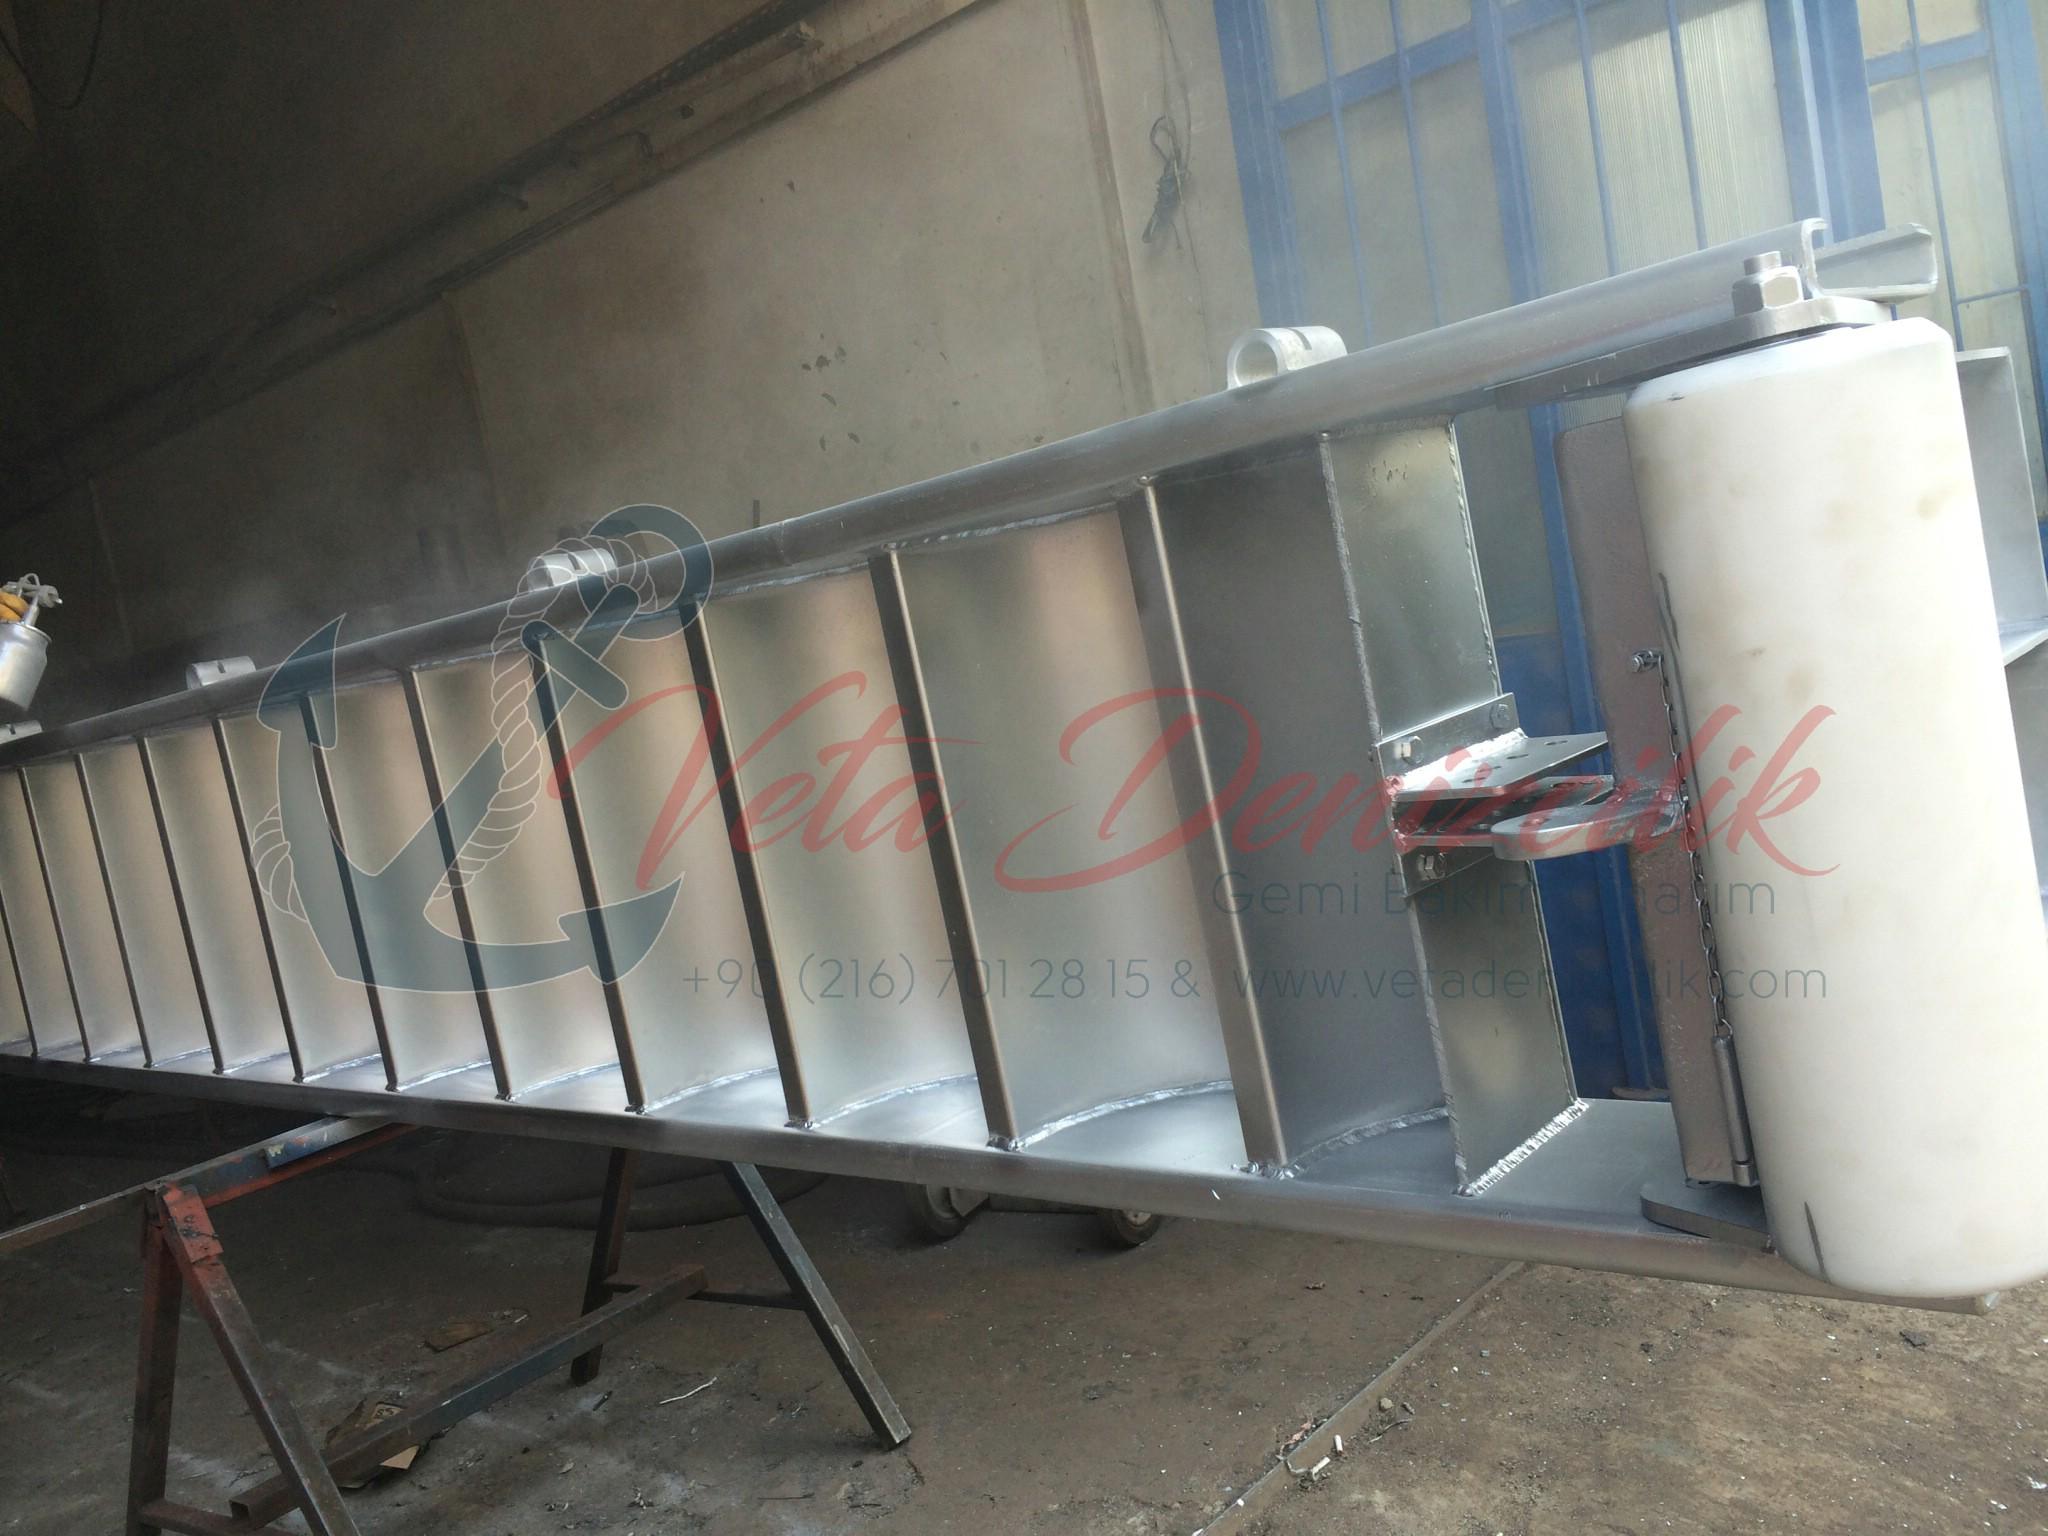 surme-iskele-aluminum-gangway-pilot-ladder-27.jpg